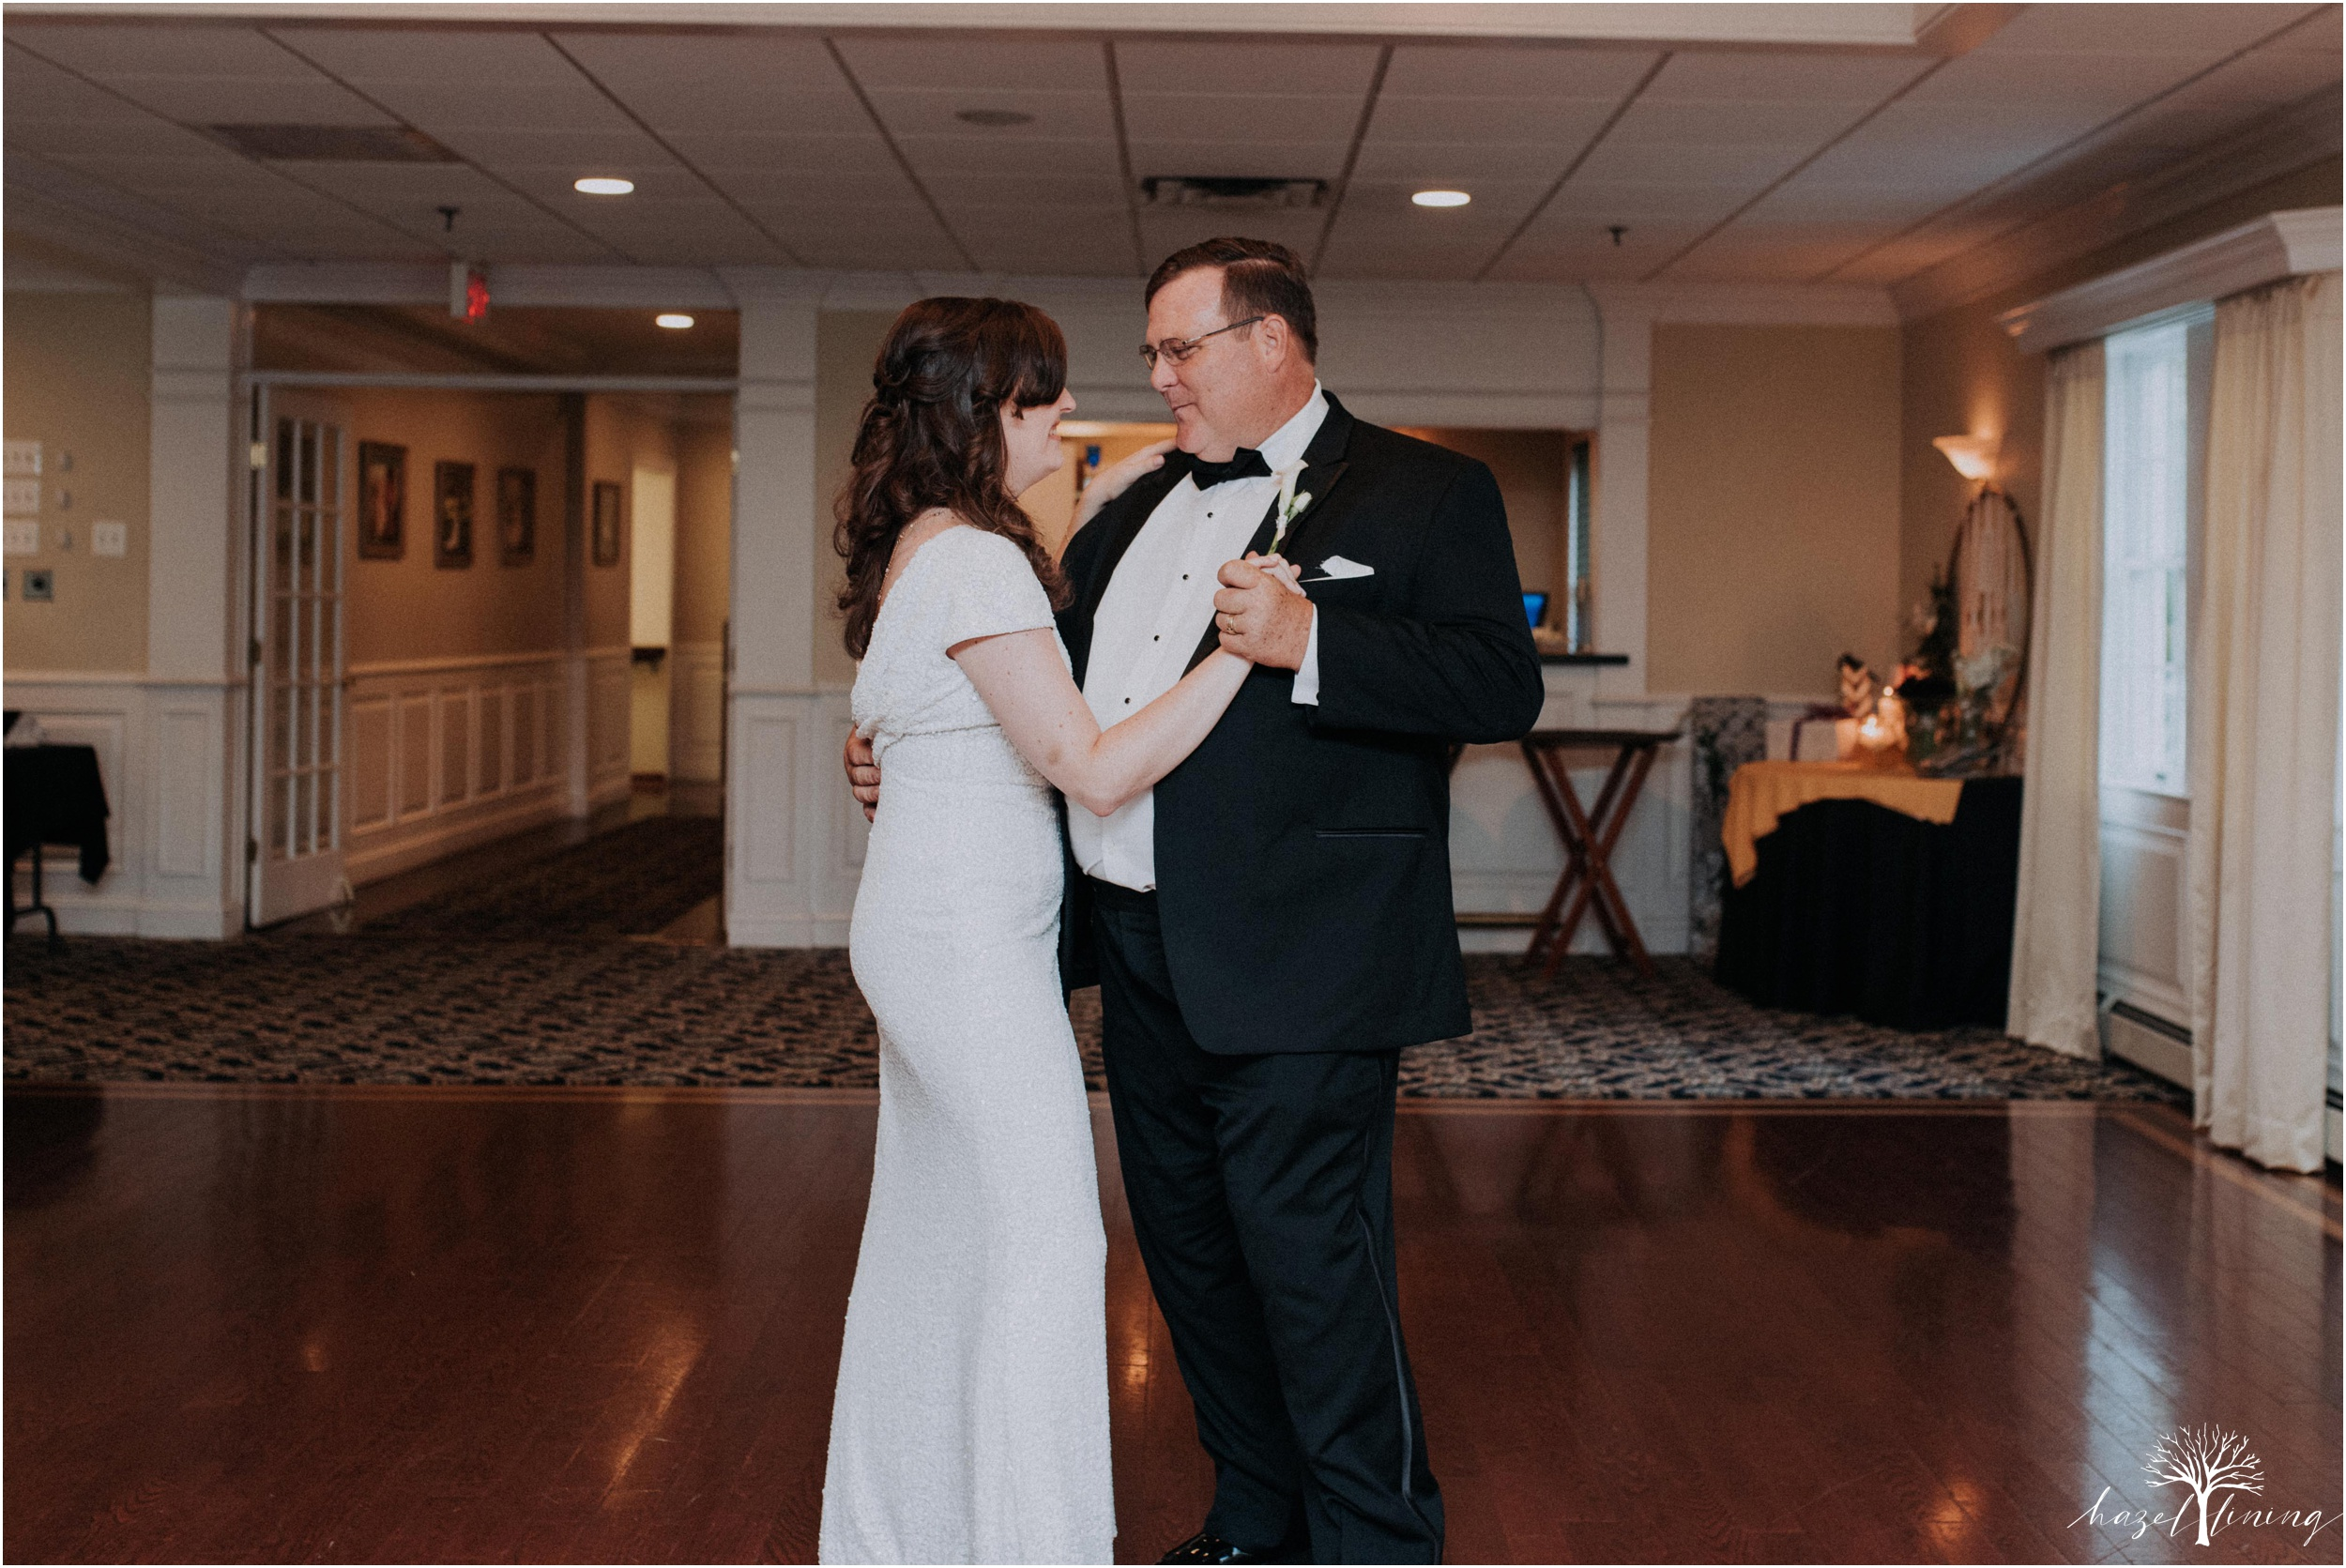 elizabeth-doelp-andrew-foreback-middletown-country-club-summer-langhorne-pennsylvania-wedding-hazel-lining-travel-wedding-elopement-photography_0134.jpg